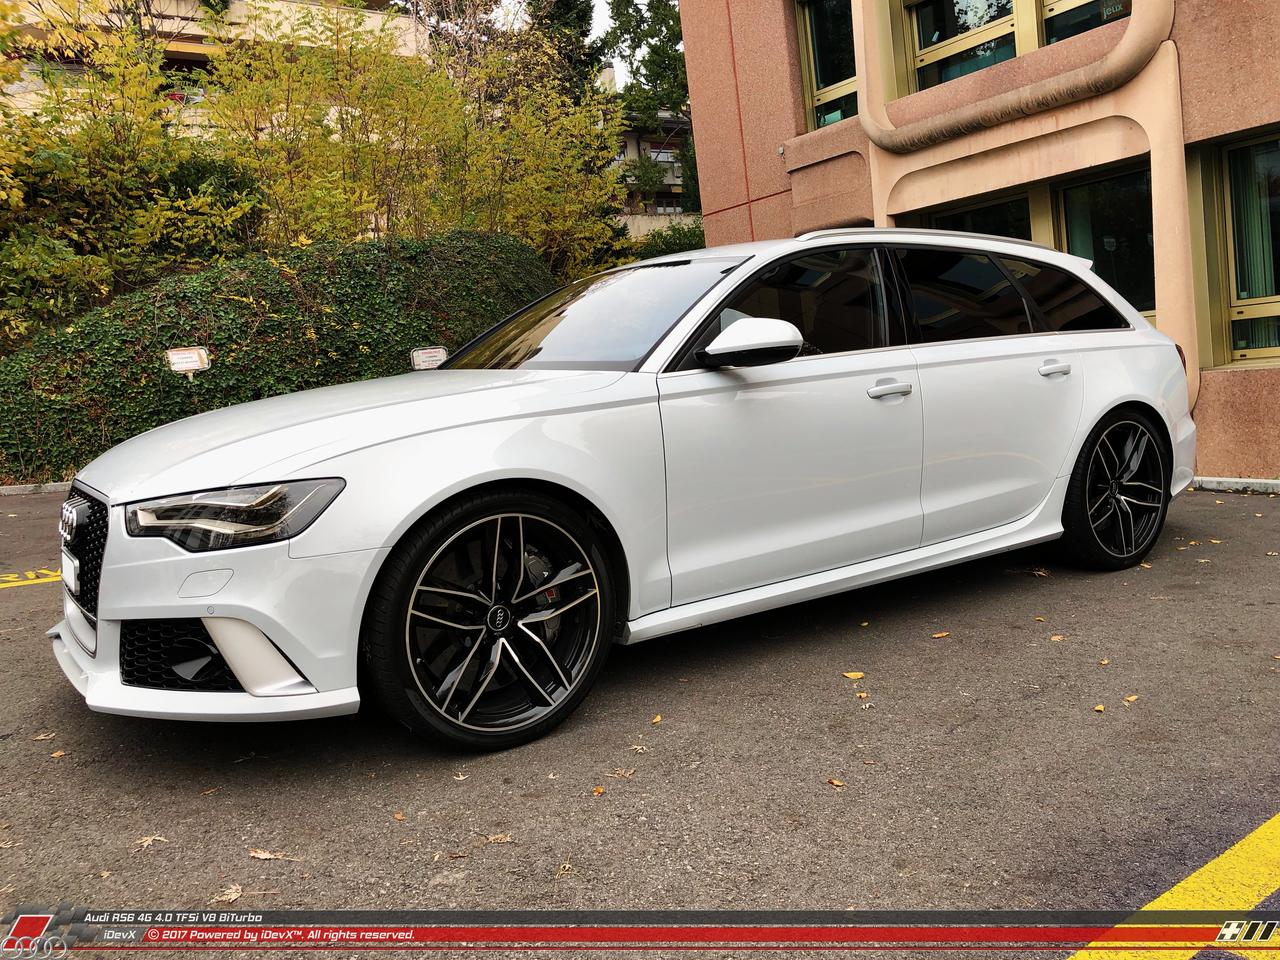 10_11.2018_Audi-RS6_iDevX_033.png